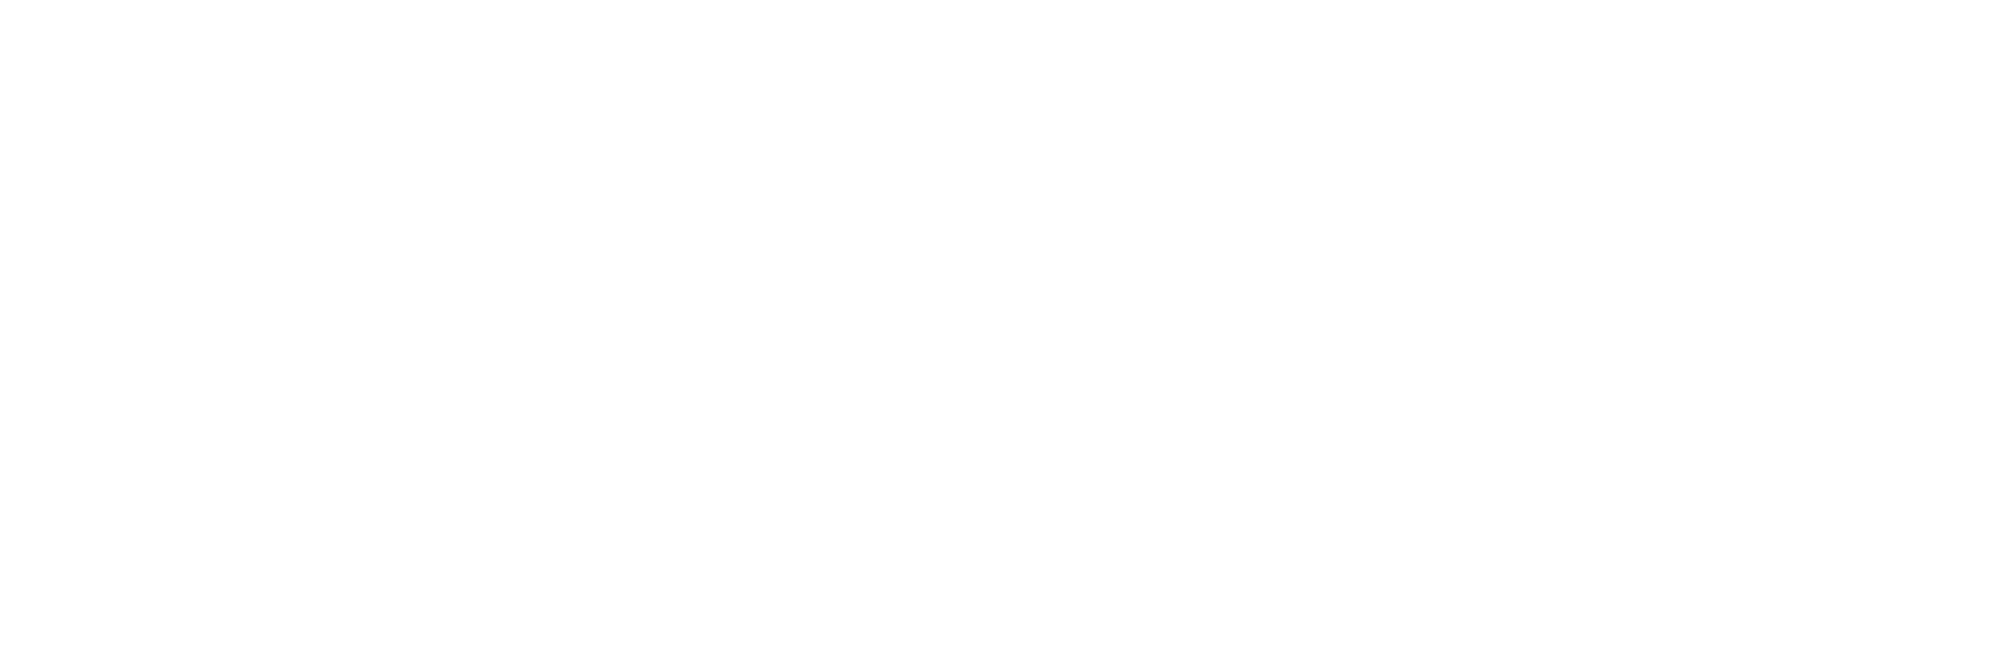 LendRight Mortgage - Utah Mortgage Broker